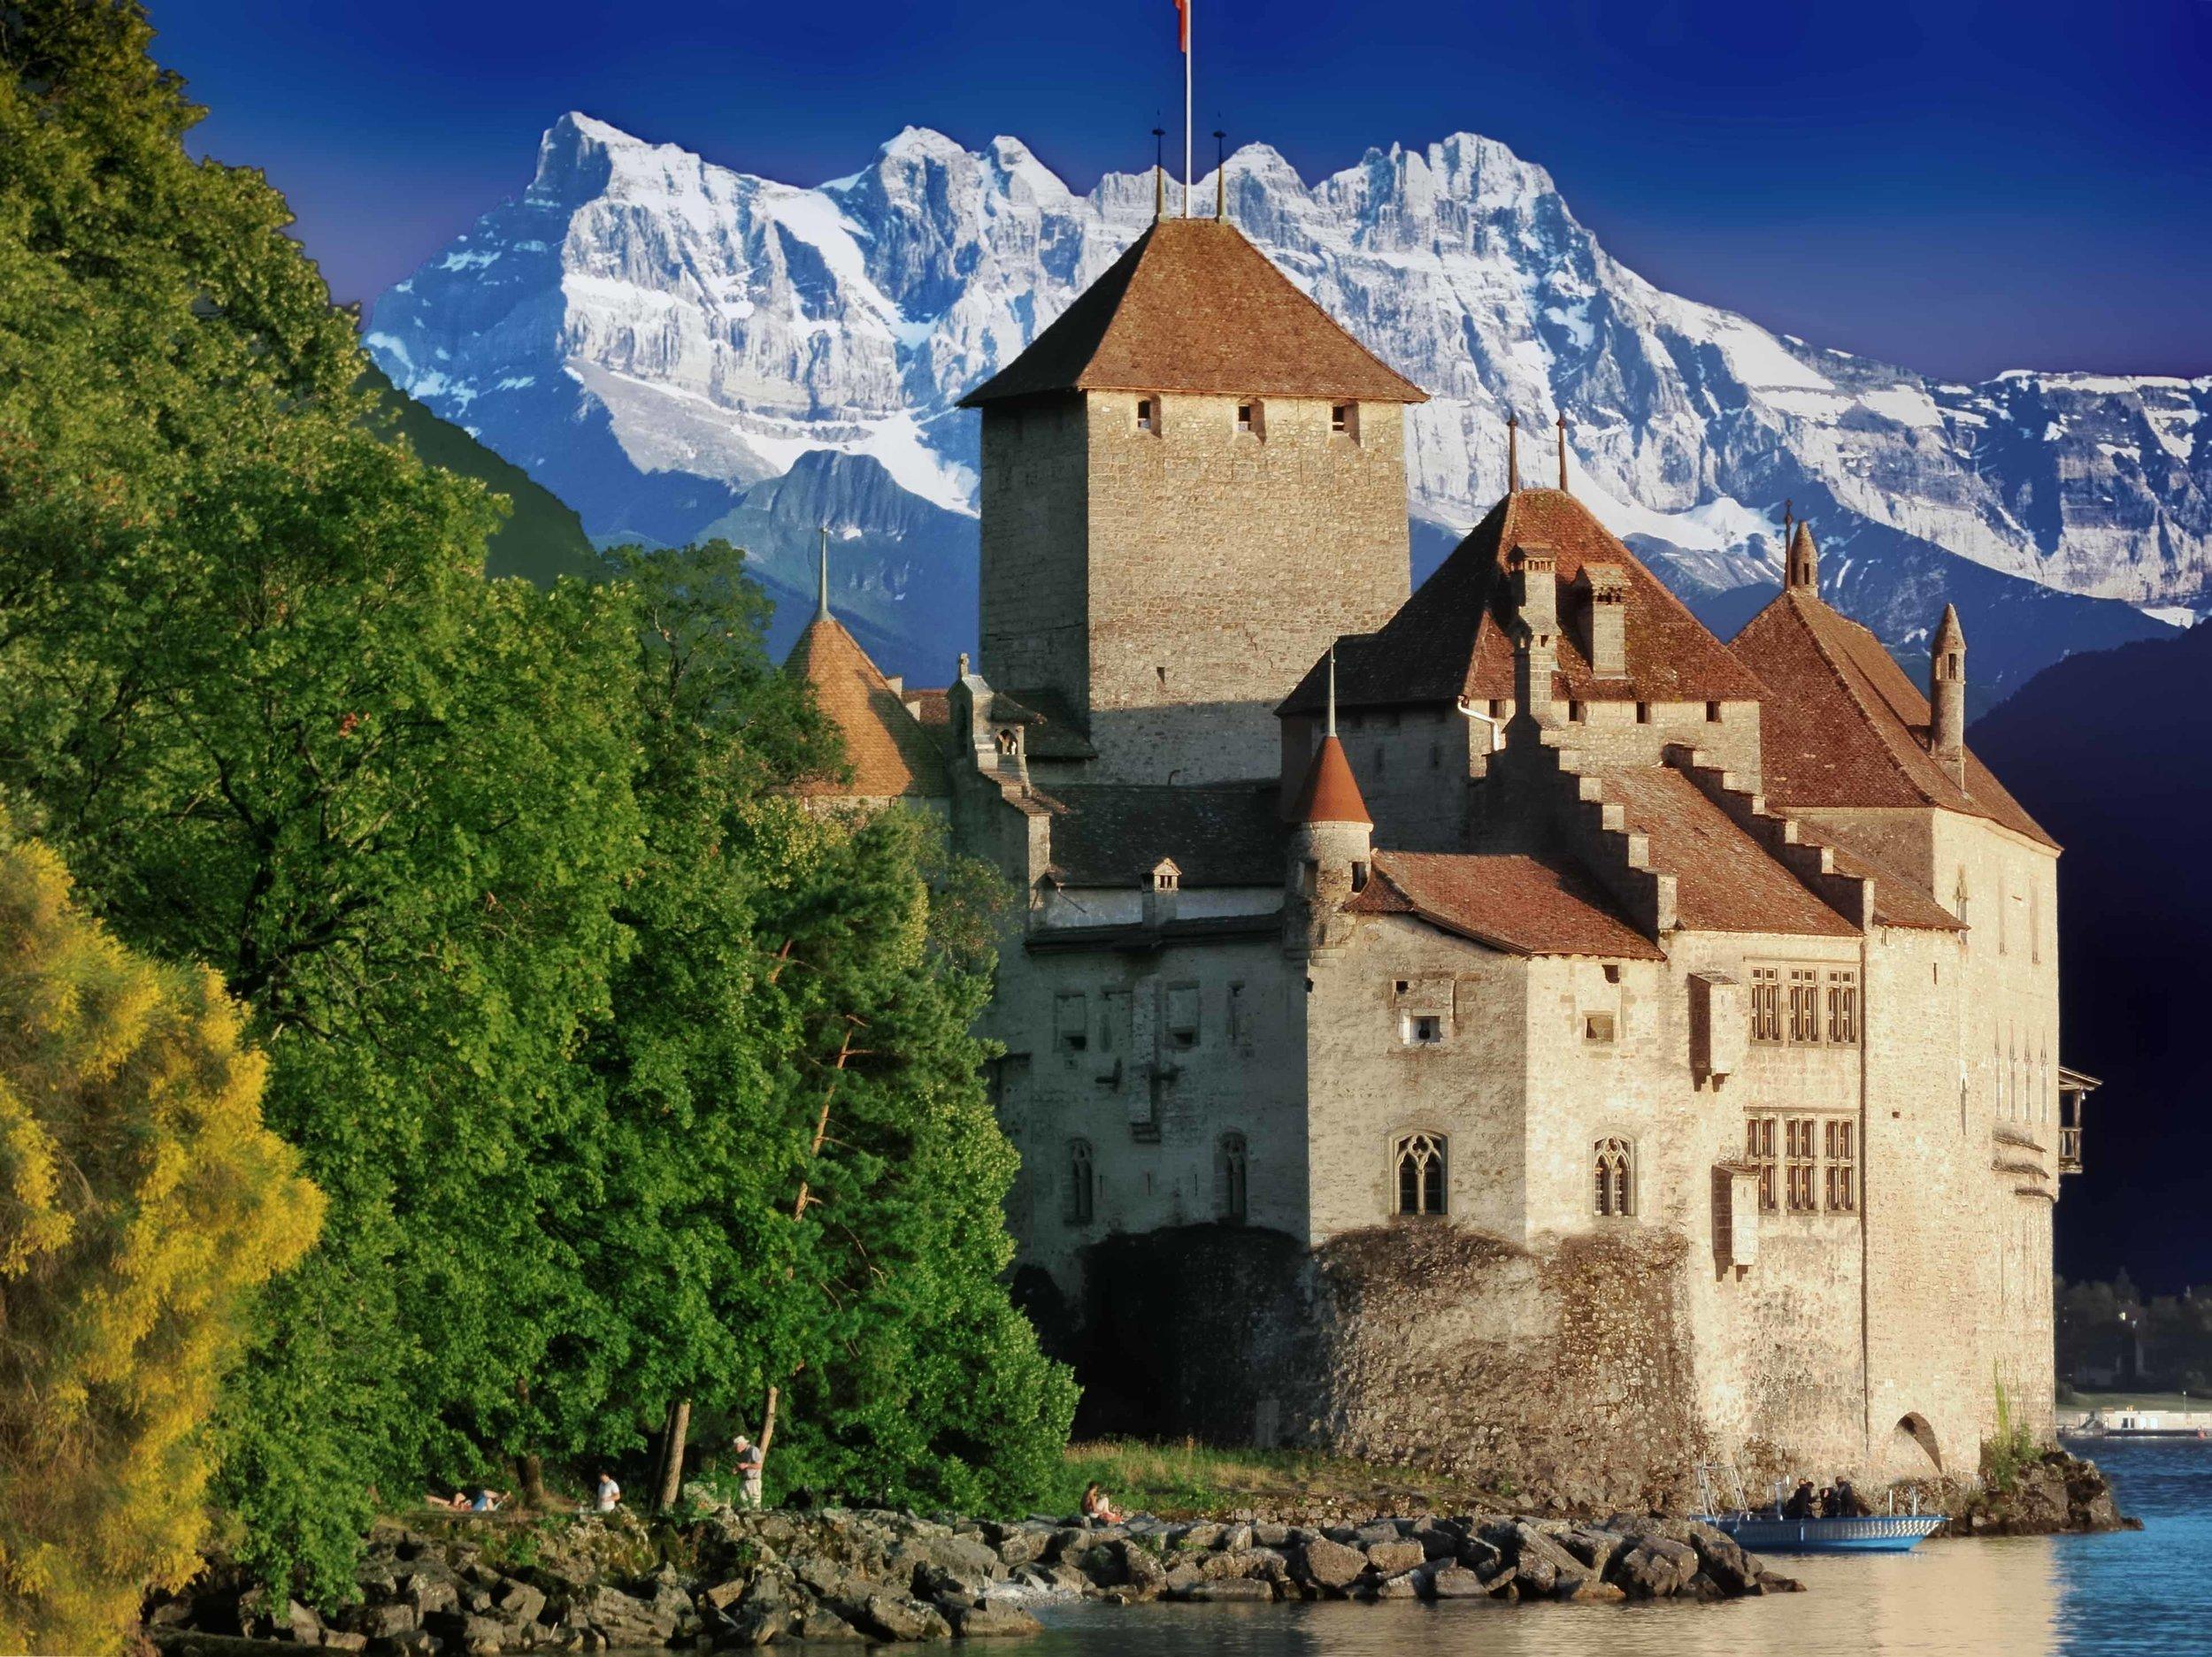 Castle_of_Chillon